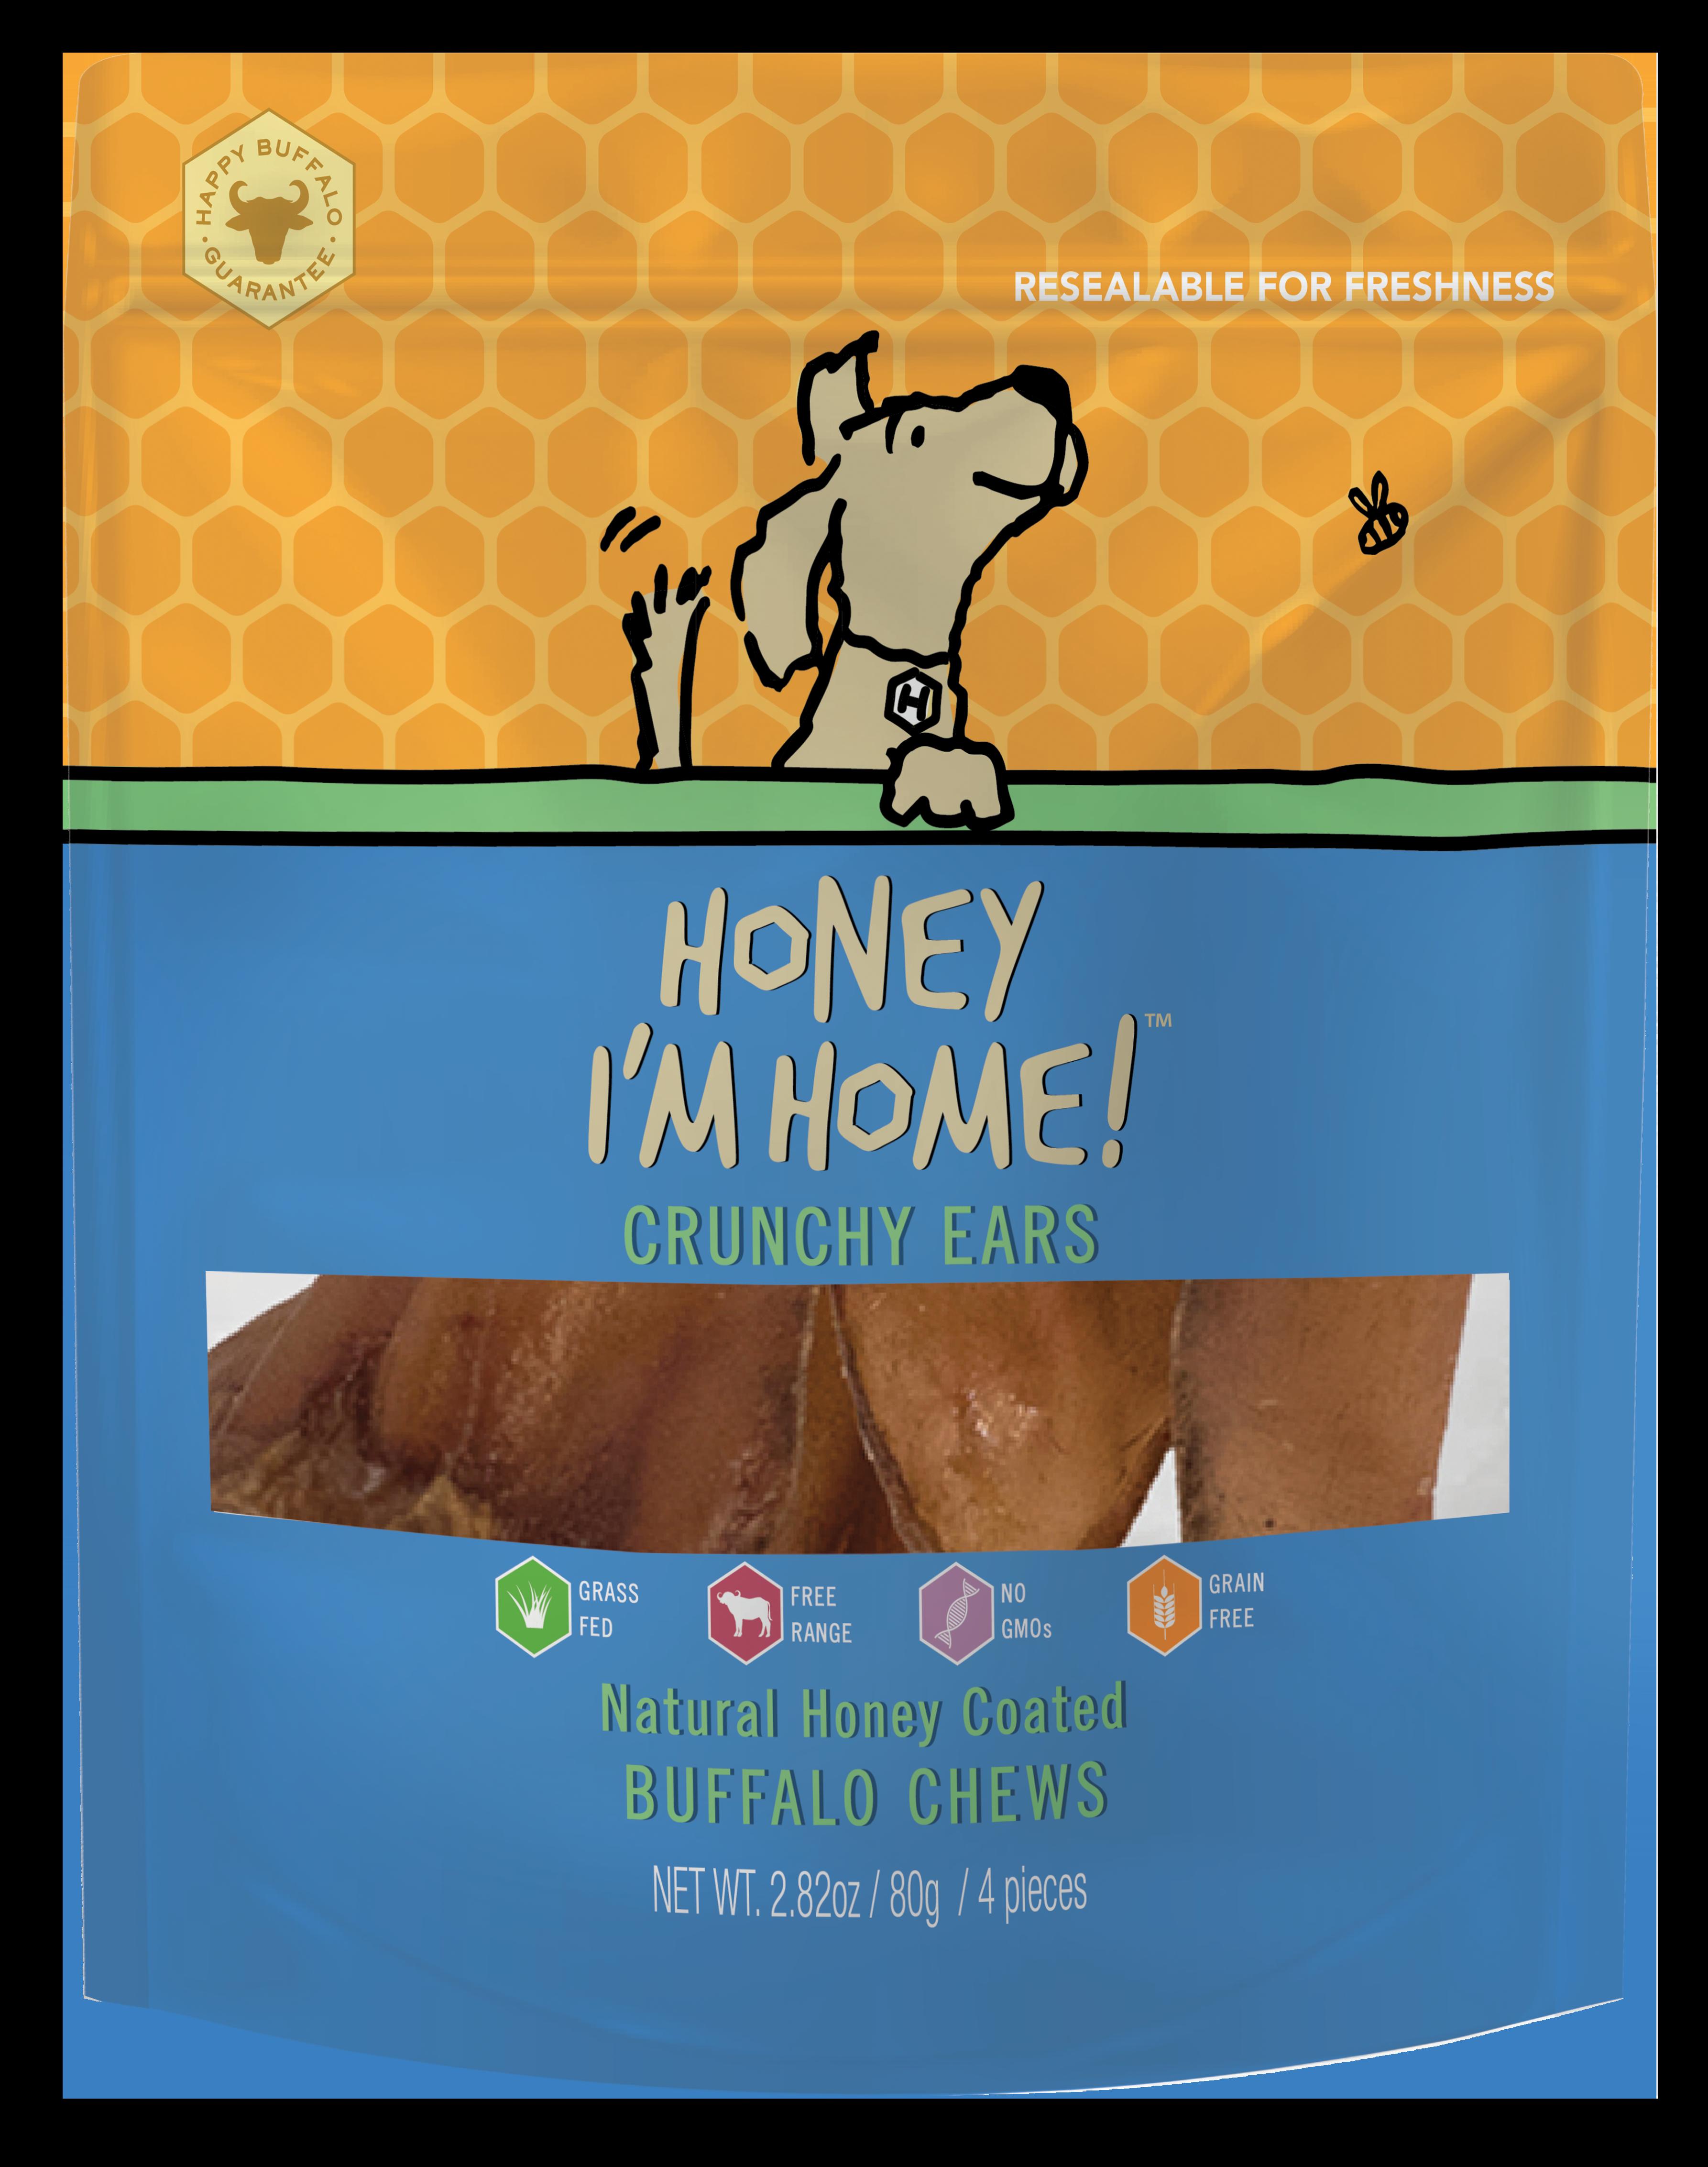 Honey I'm Home Natural Honey Coated Buffalo Crunchy Ears Dog Chews, 4-pack